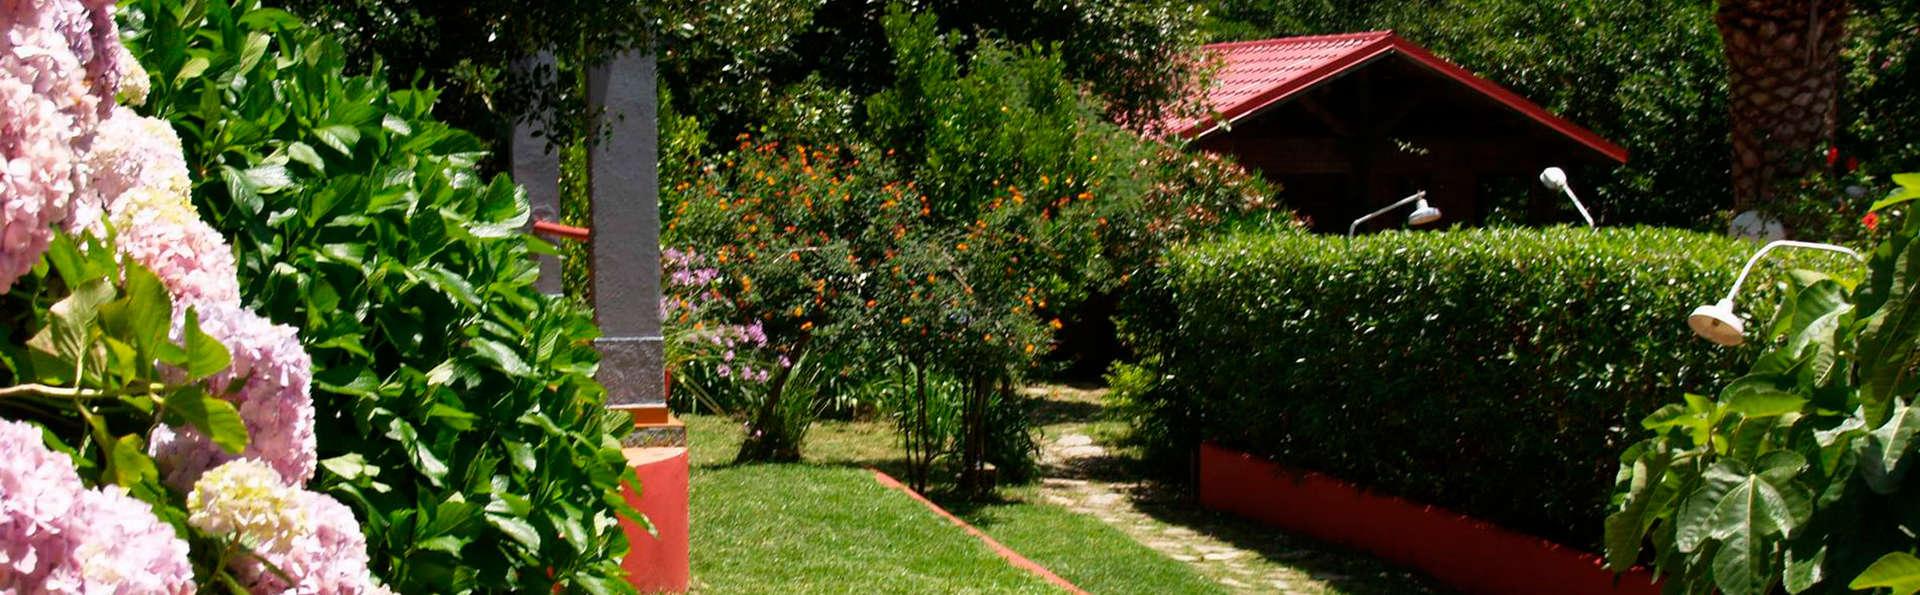 Hotel Mesón de Sancho - edit_jardin.jpg